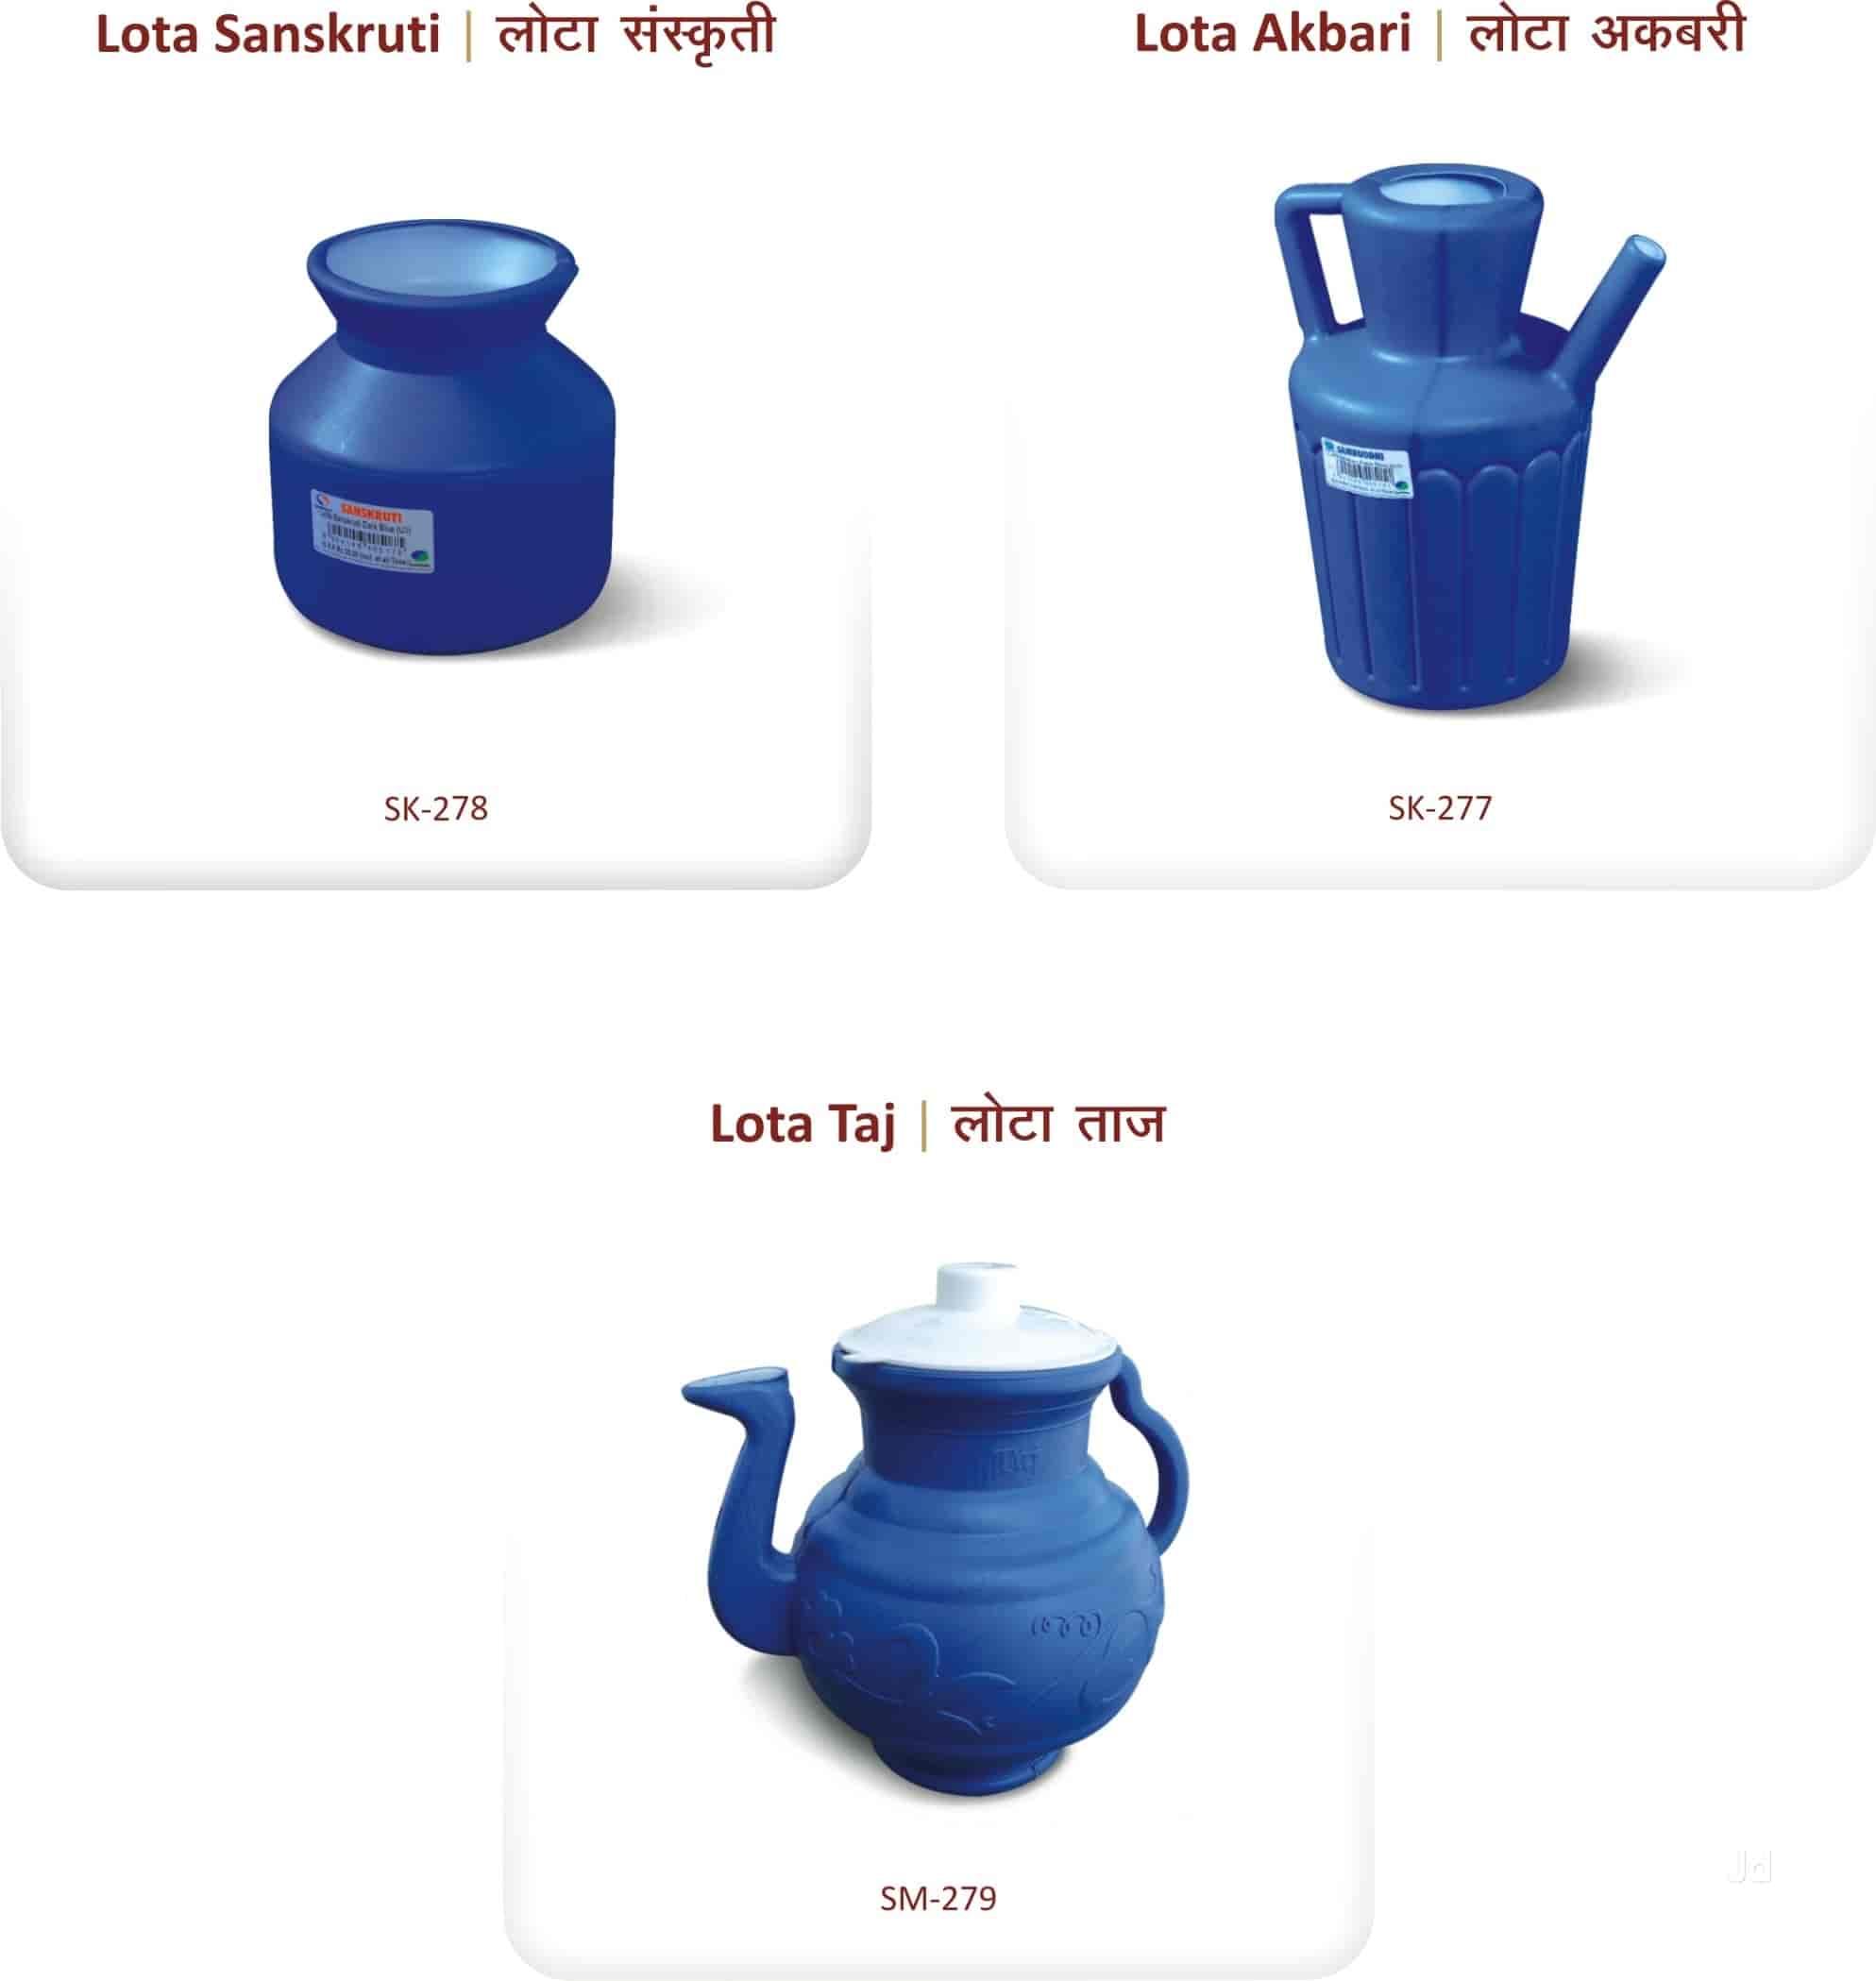 Samruddhi Family Shopee, Hadapsar - Plastic Dustbin Dealers